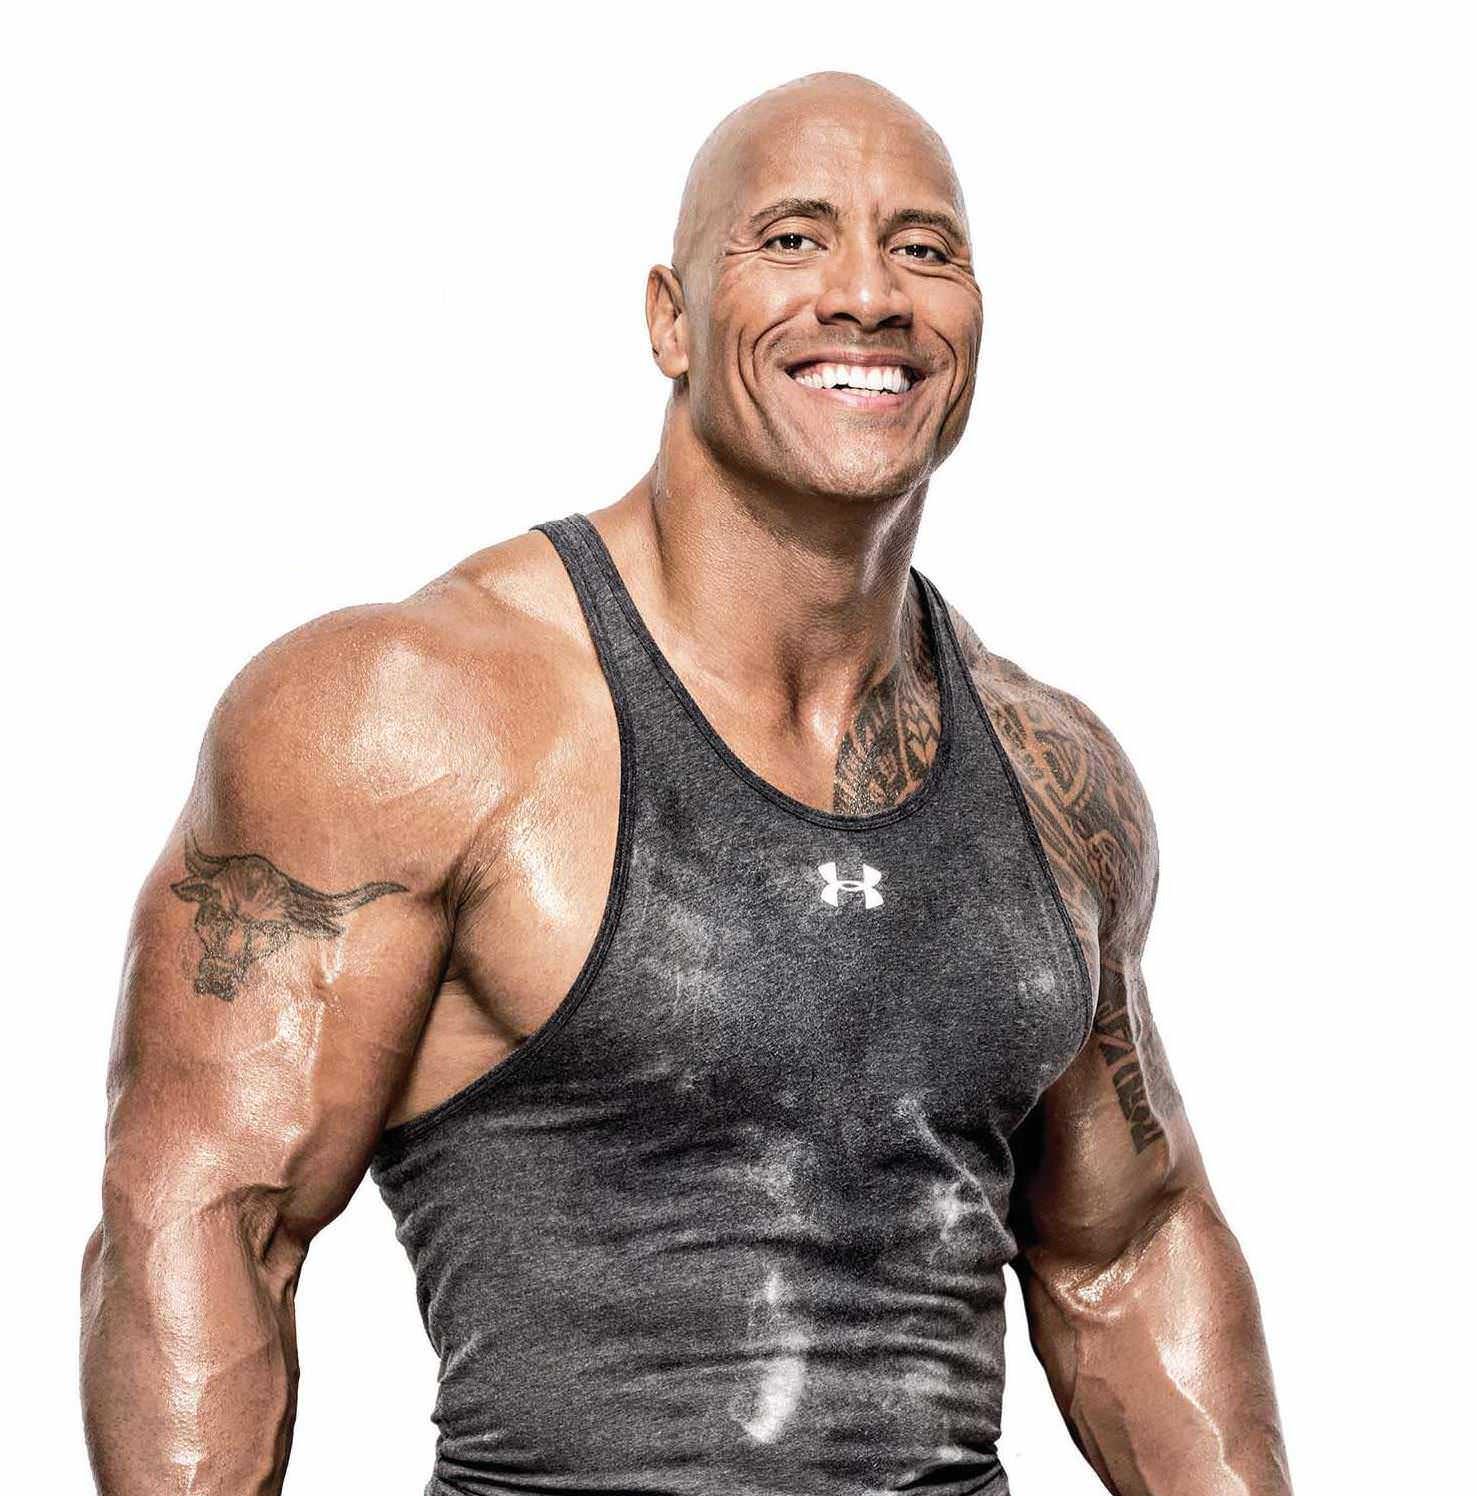 The Evolution of Dwayne 'The Rock' Johnson